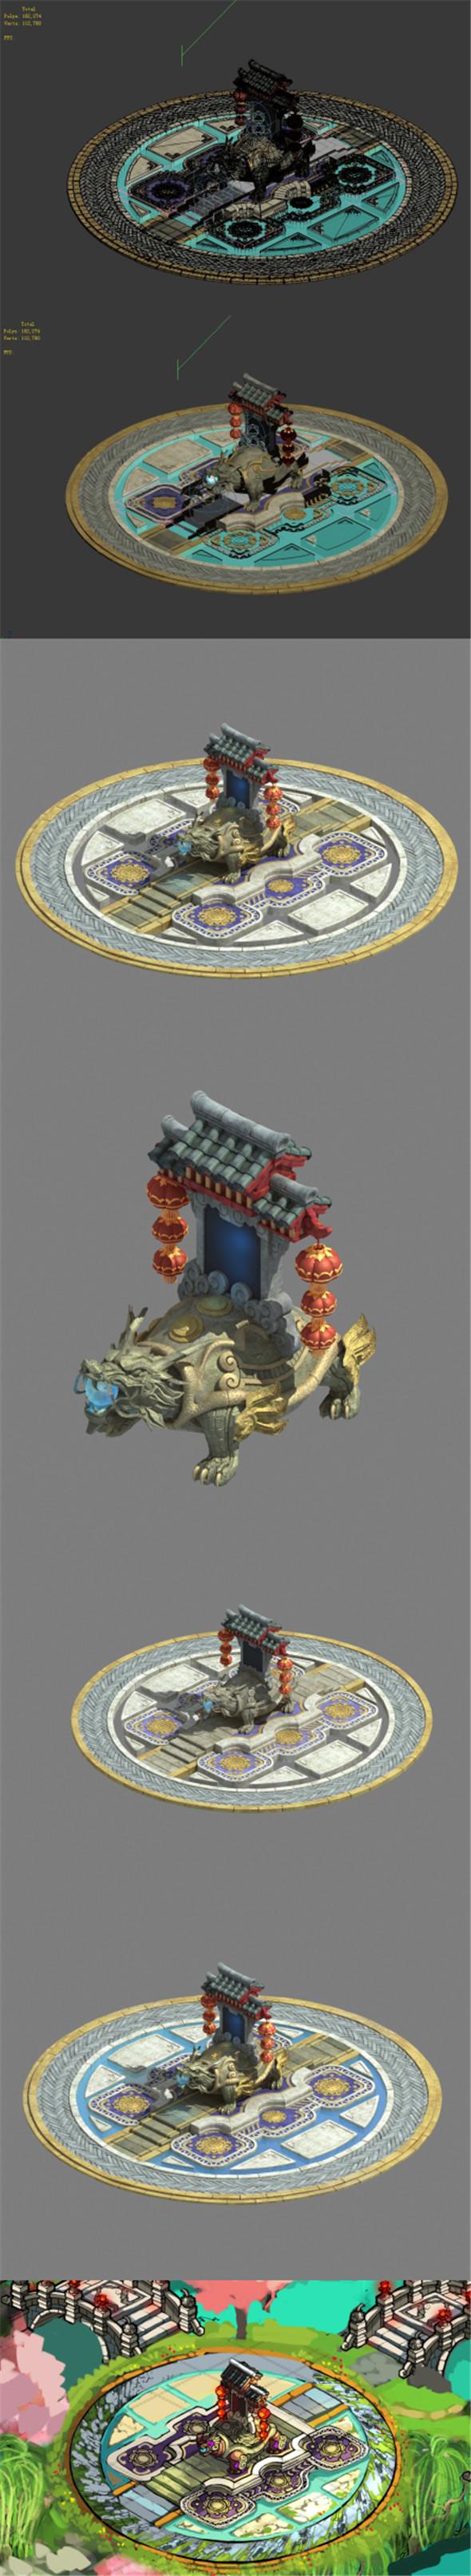 Xinshoucun - Long turtle stone decoration - 3DOcean Item for Sale